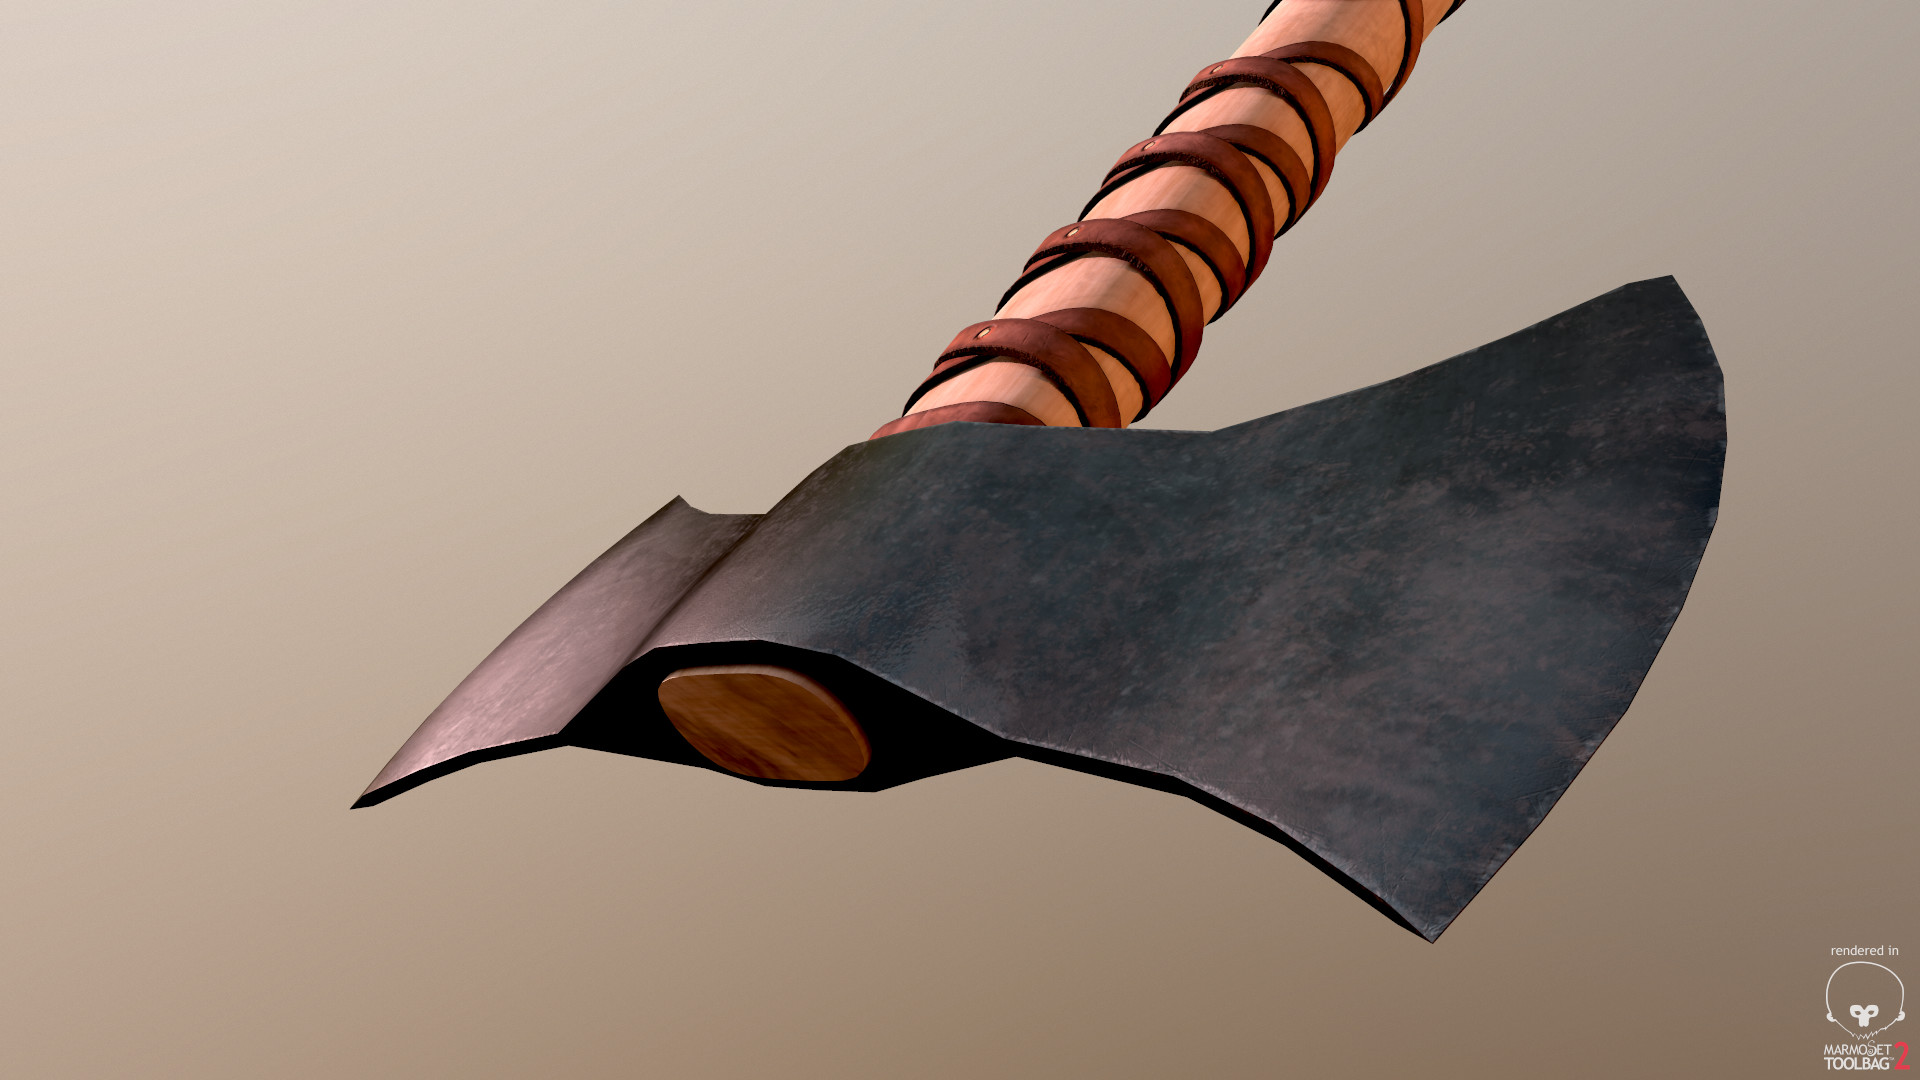 Bela csampai two headed viking axe preview mt 03